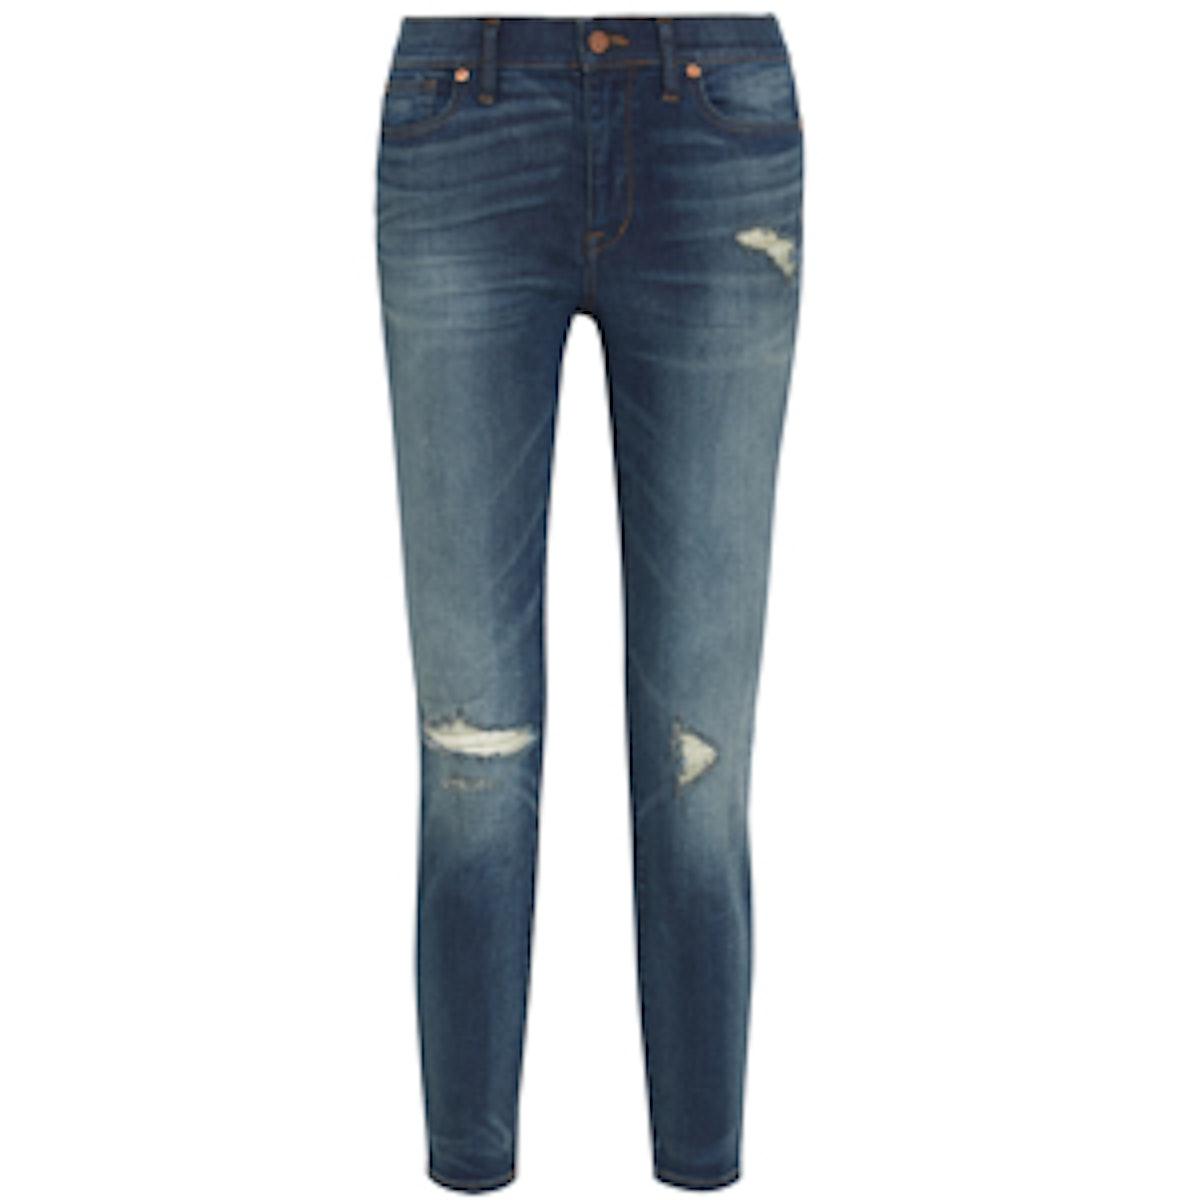 The High Riser Distressed Skinny Jean